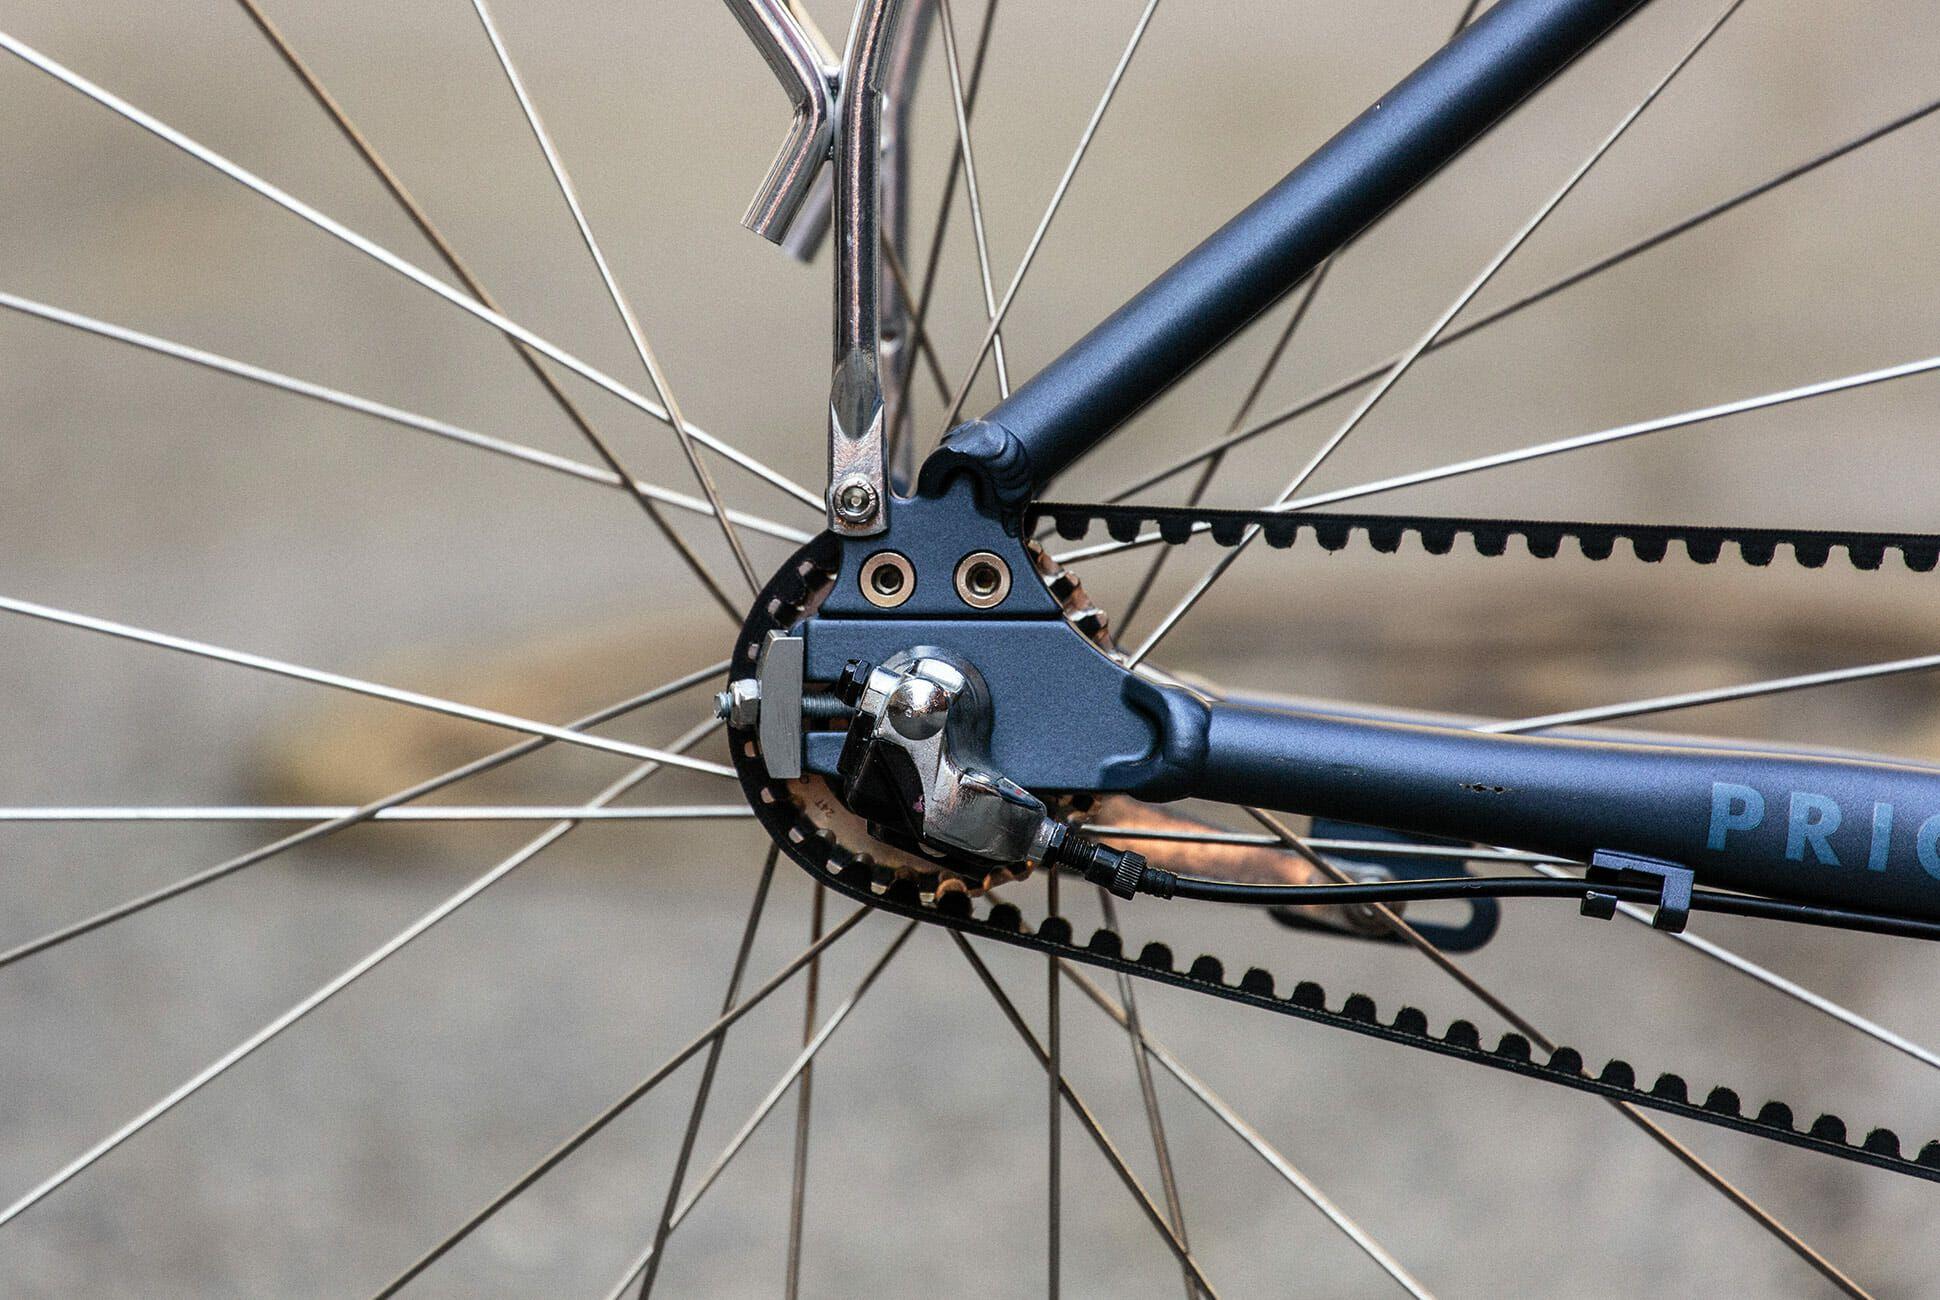 Priority-No-Maintenance-Bike-gear-patrol-slide-3